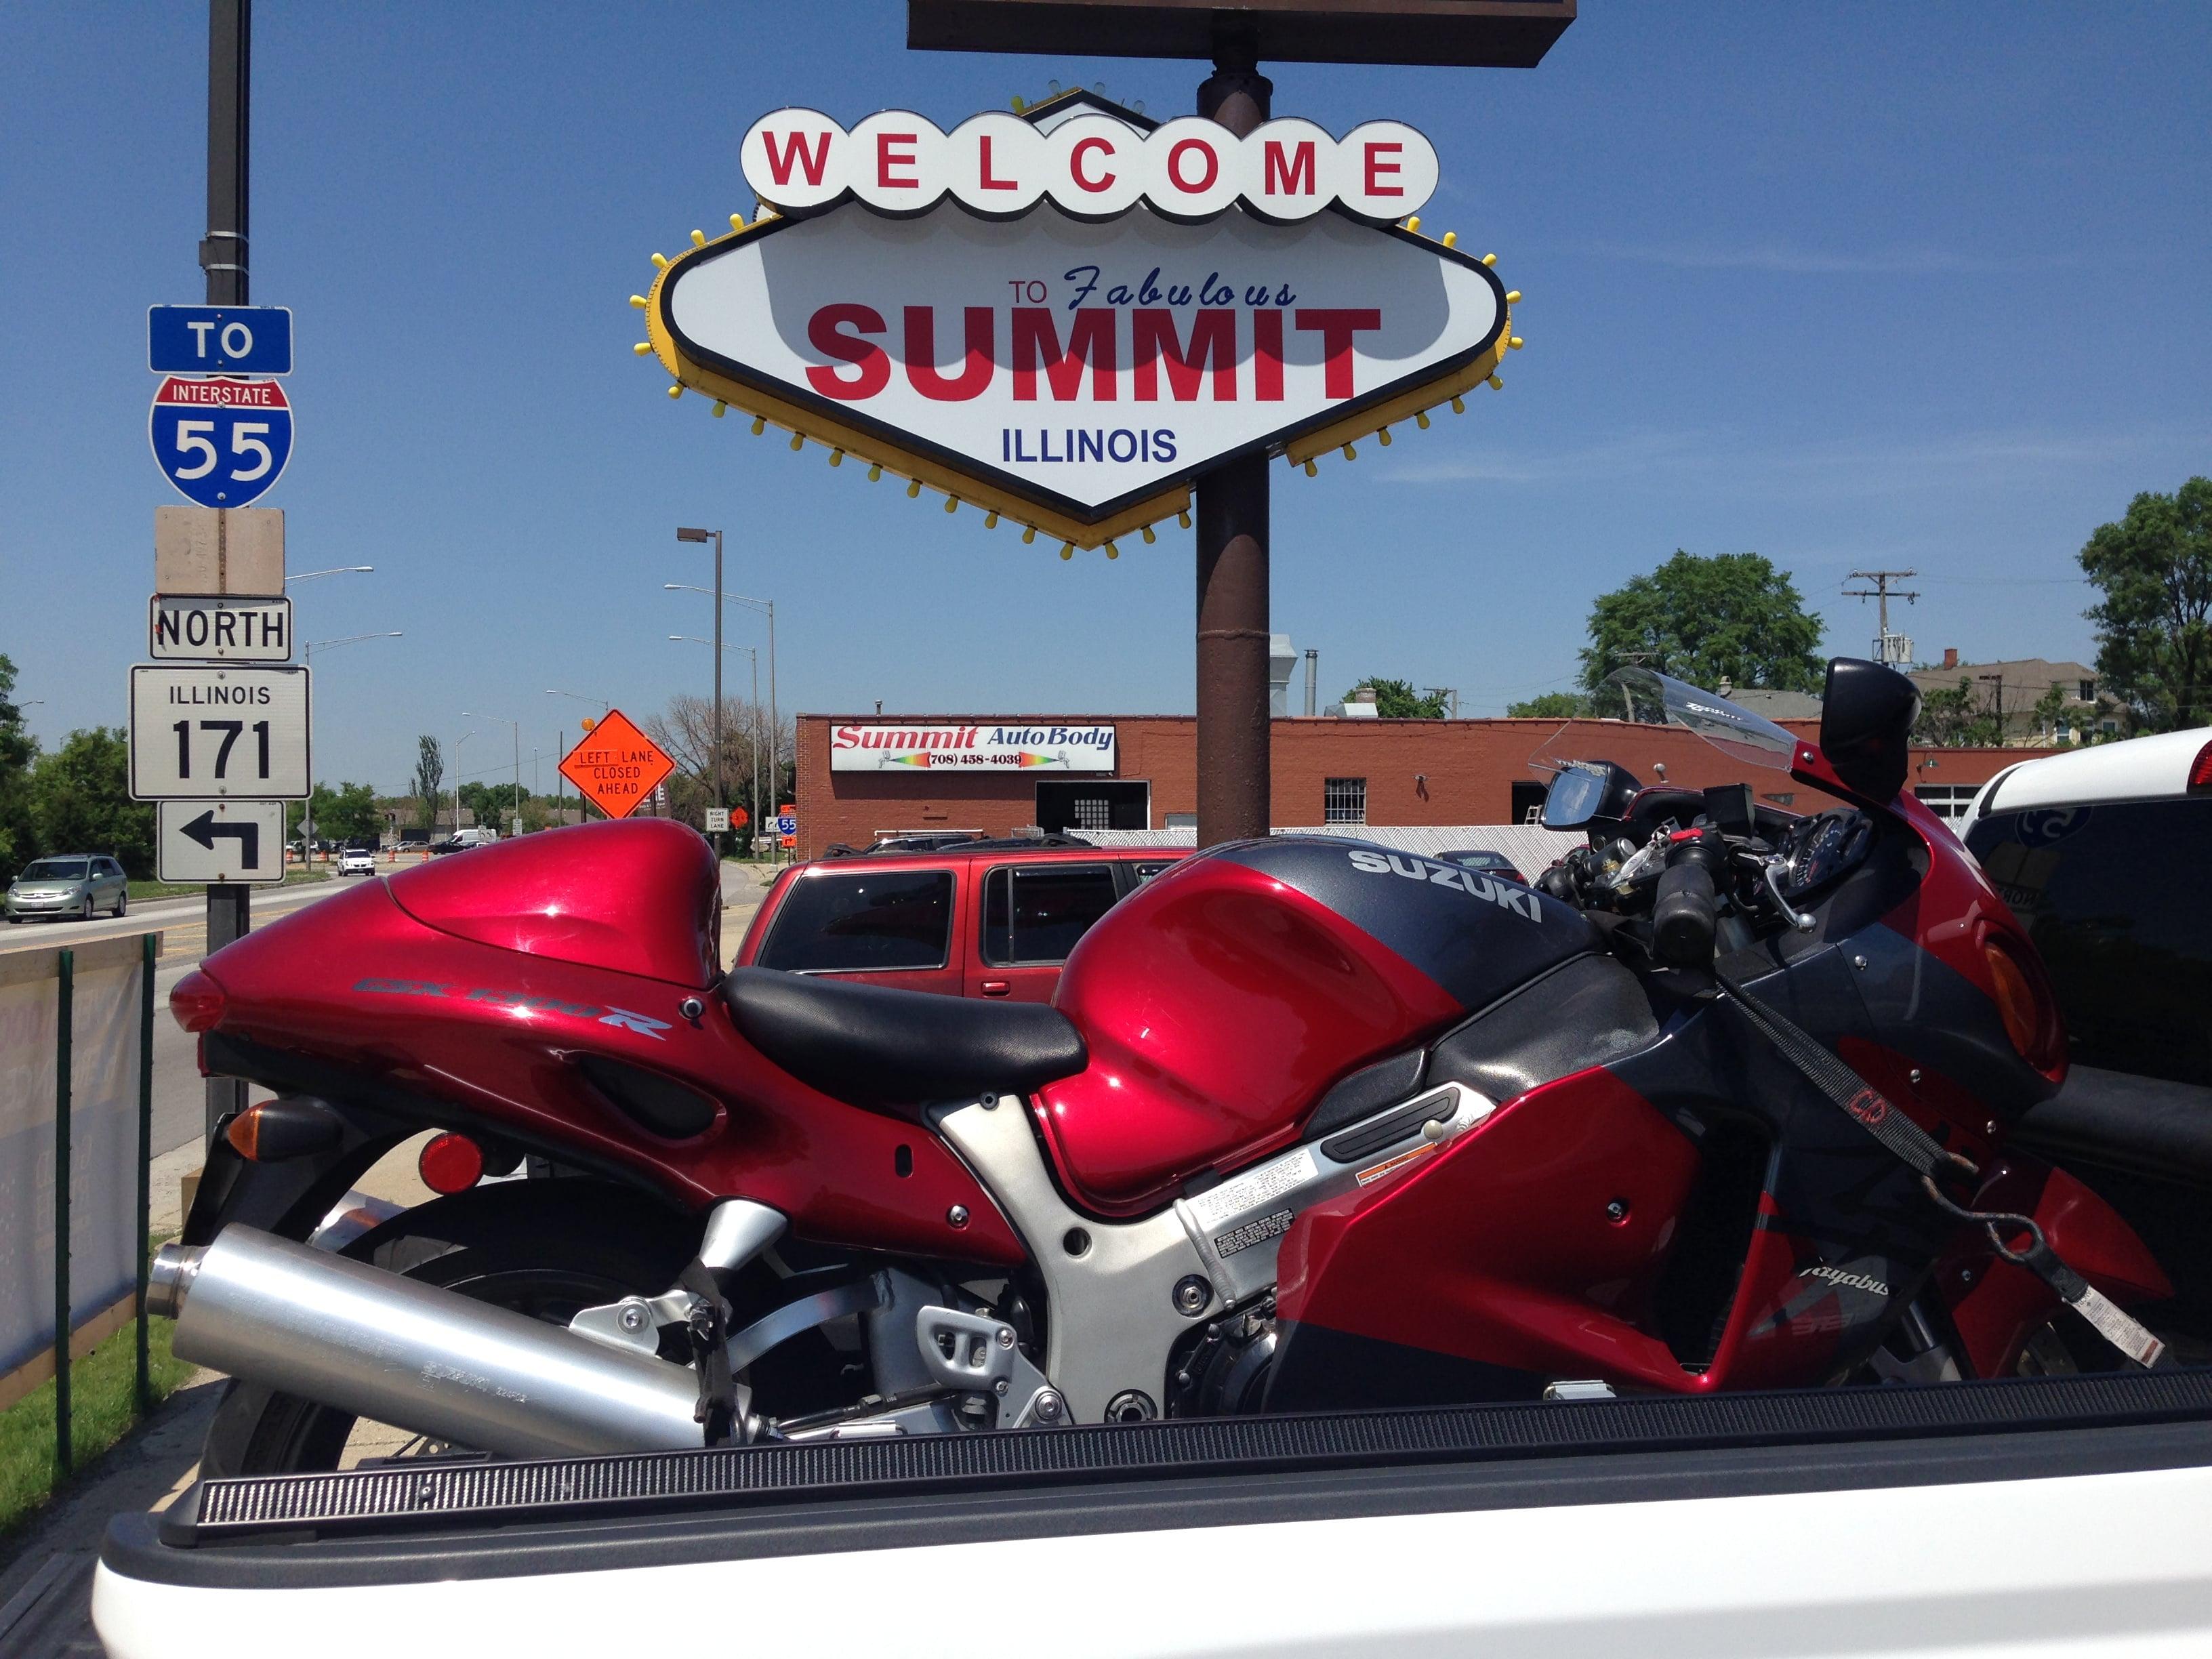 Cash 4 Motorcycles | We Make Selling Easy!